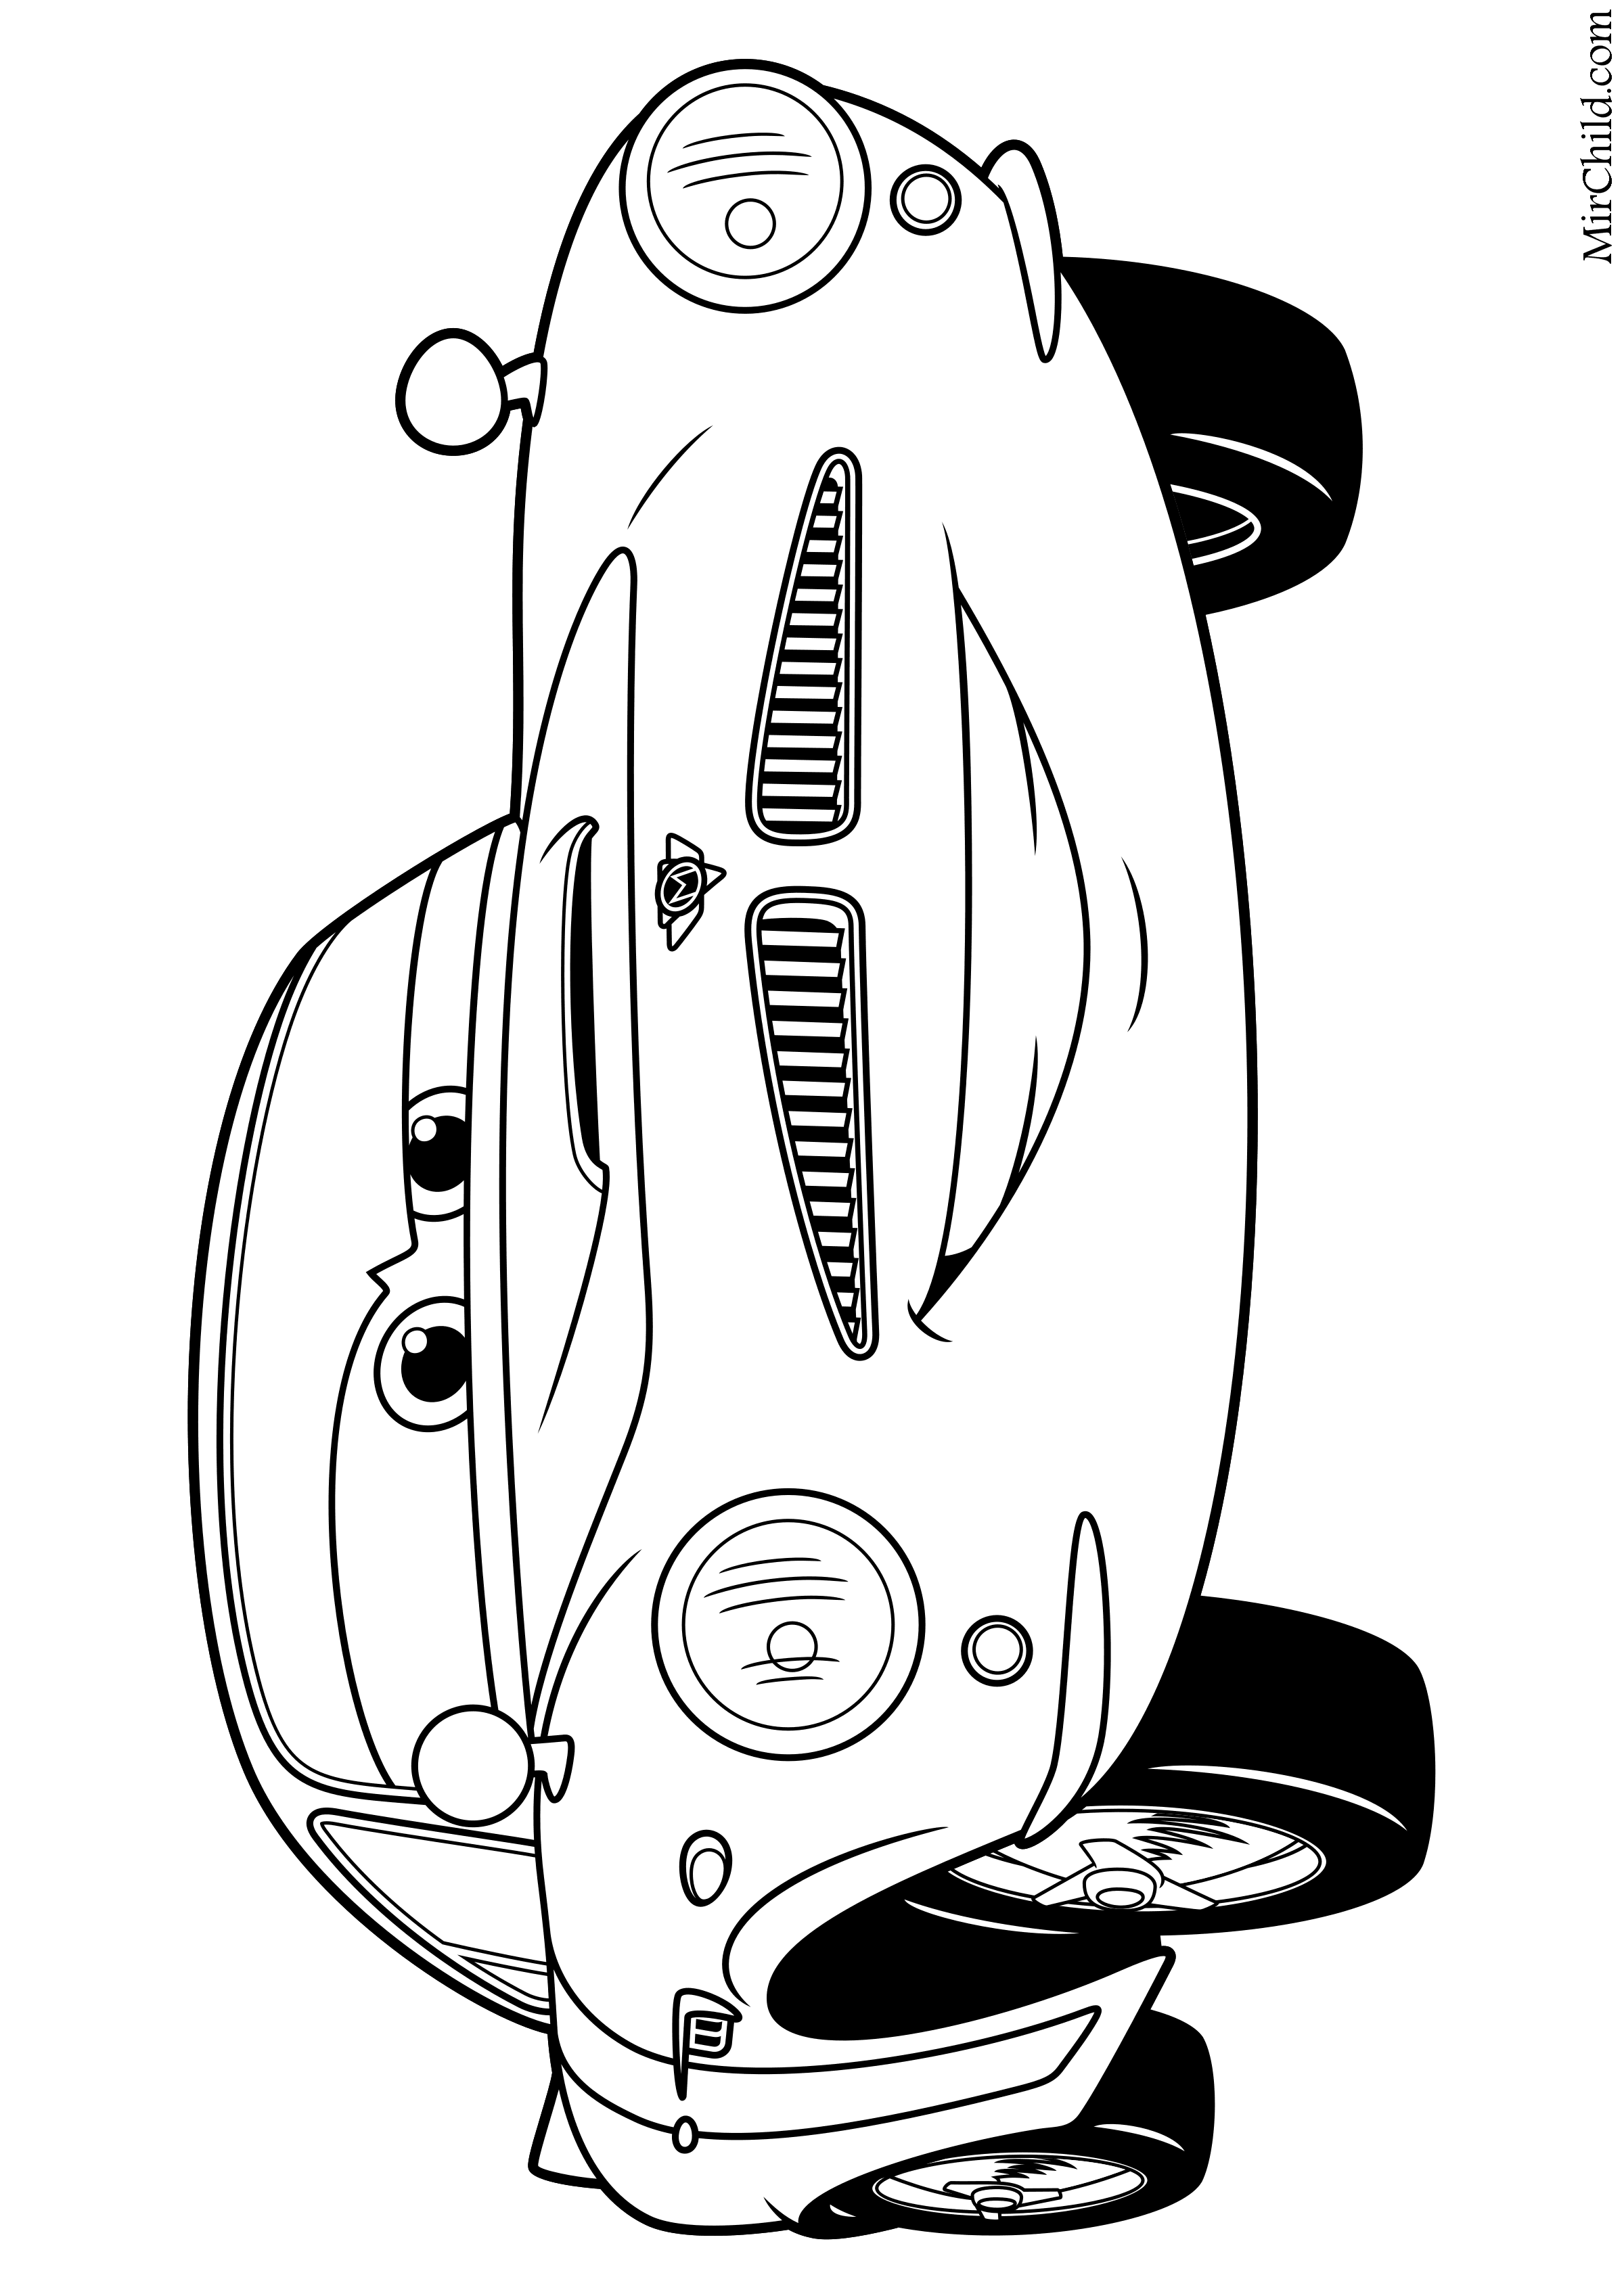 Раскраска - Тачки 2 - Финн МакМисл | MirChild